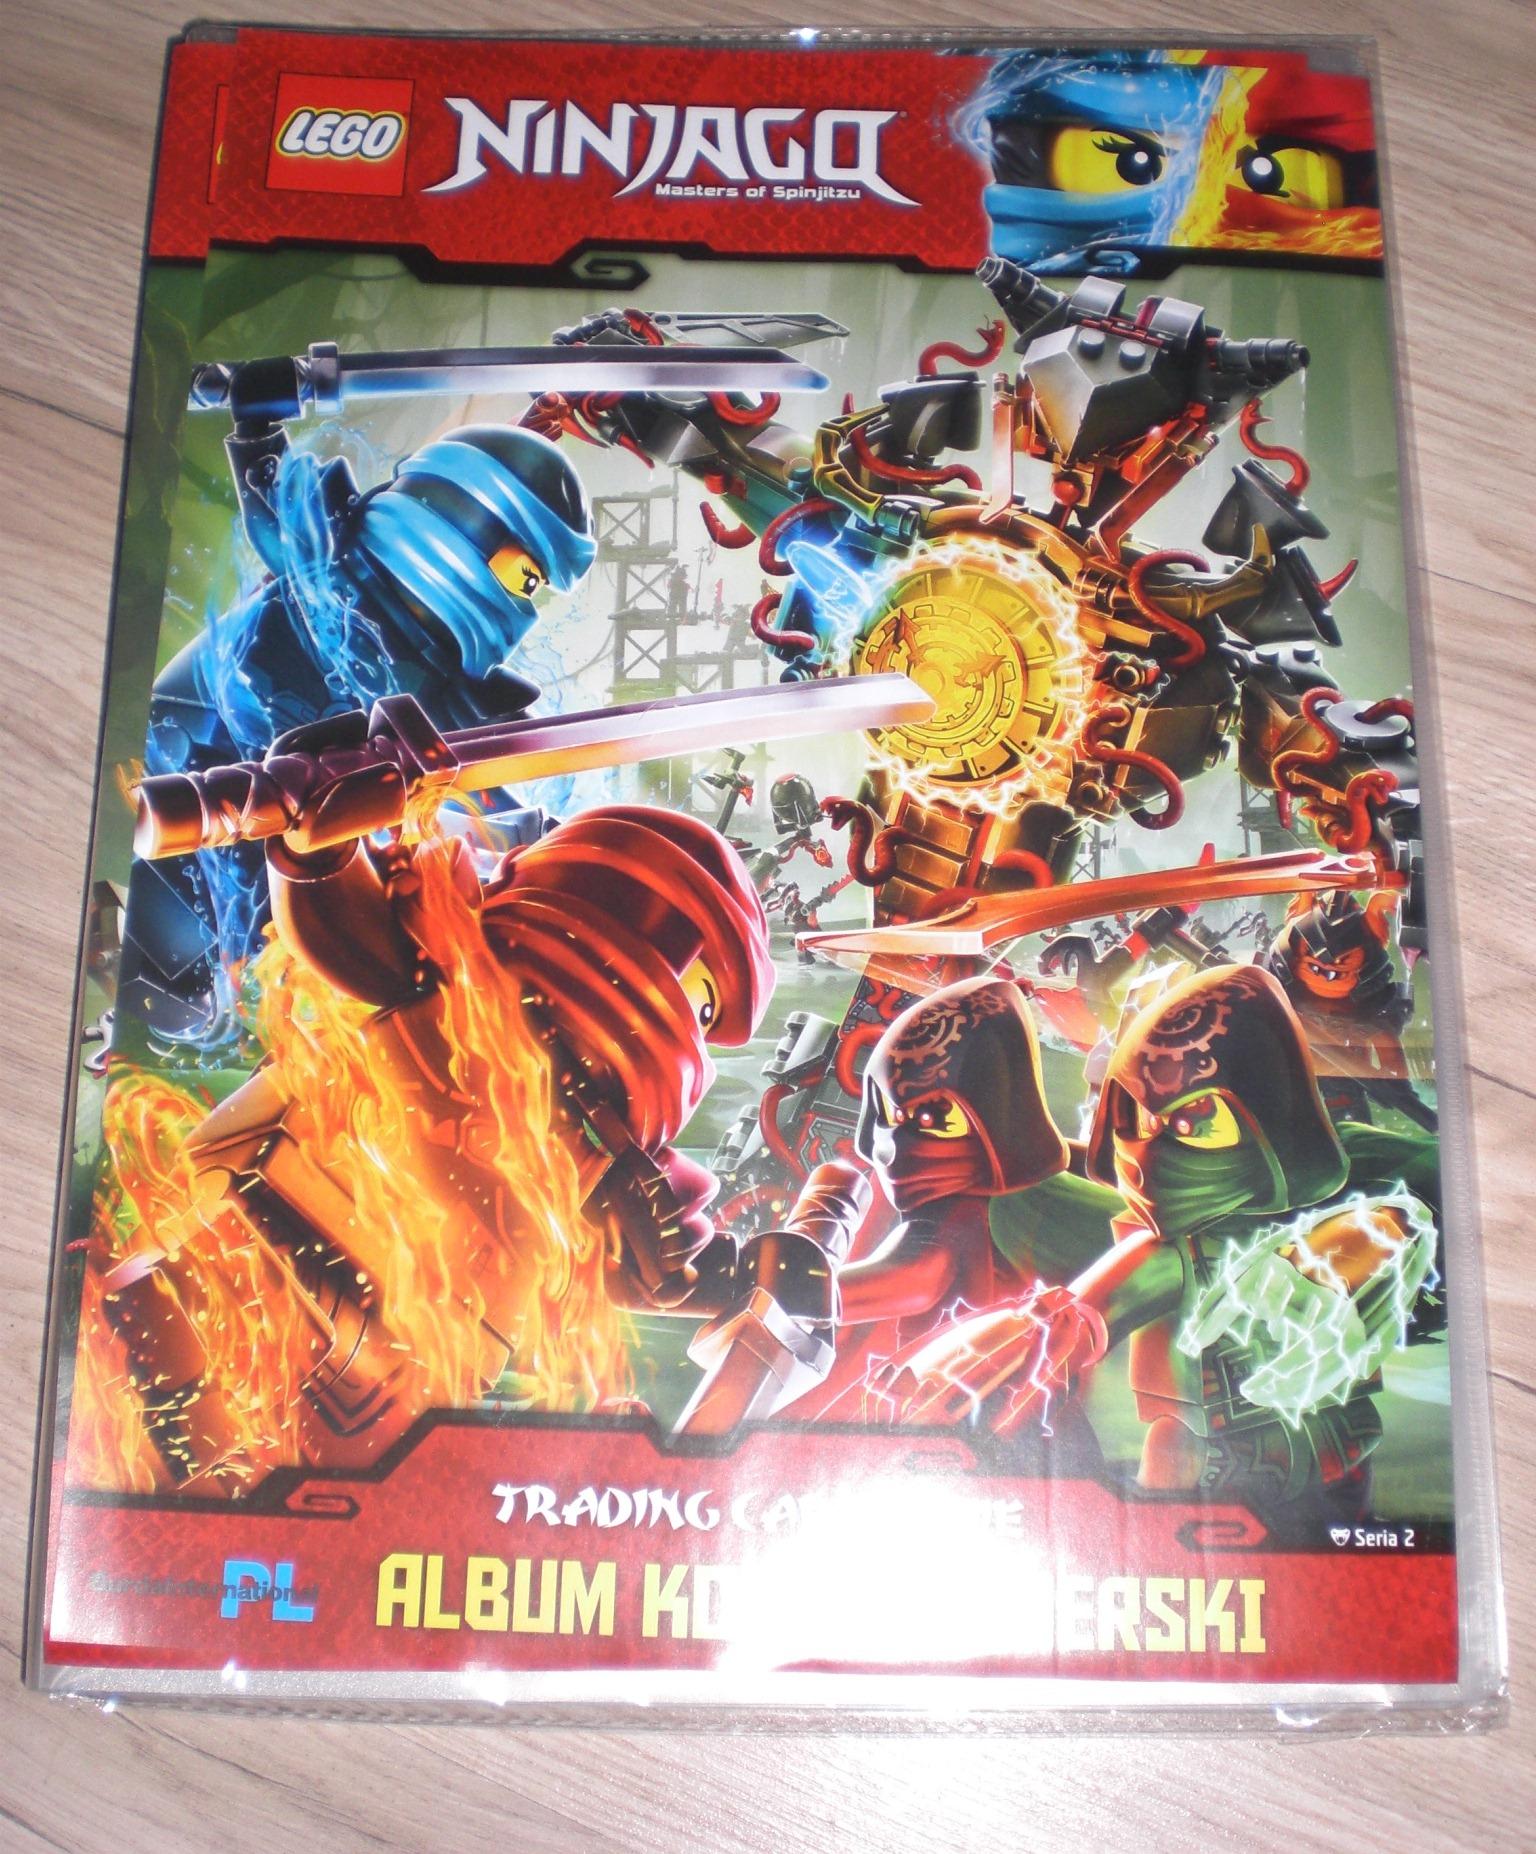 Album Klaser Na Karty Lego Ninjago Seria 2 Tcg 7009064476